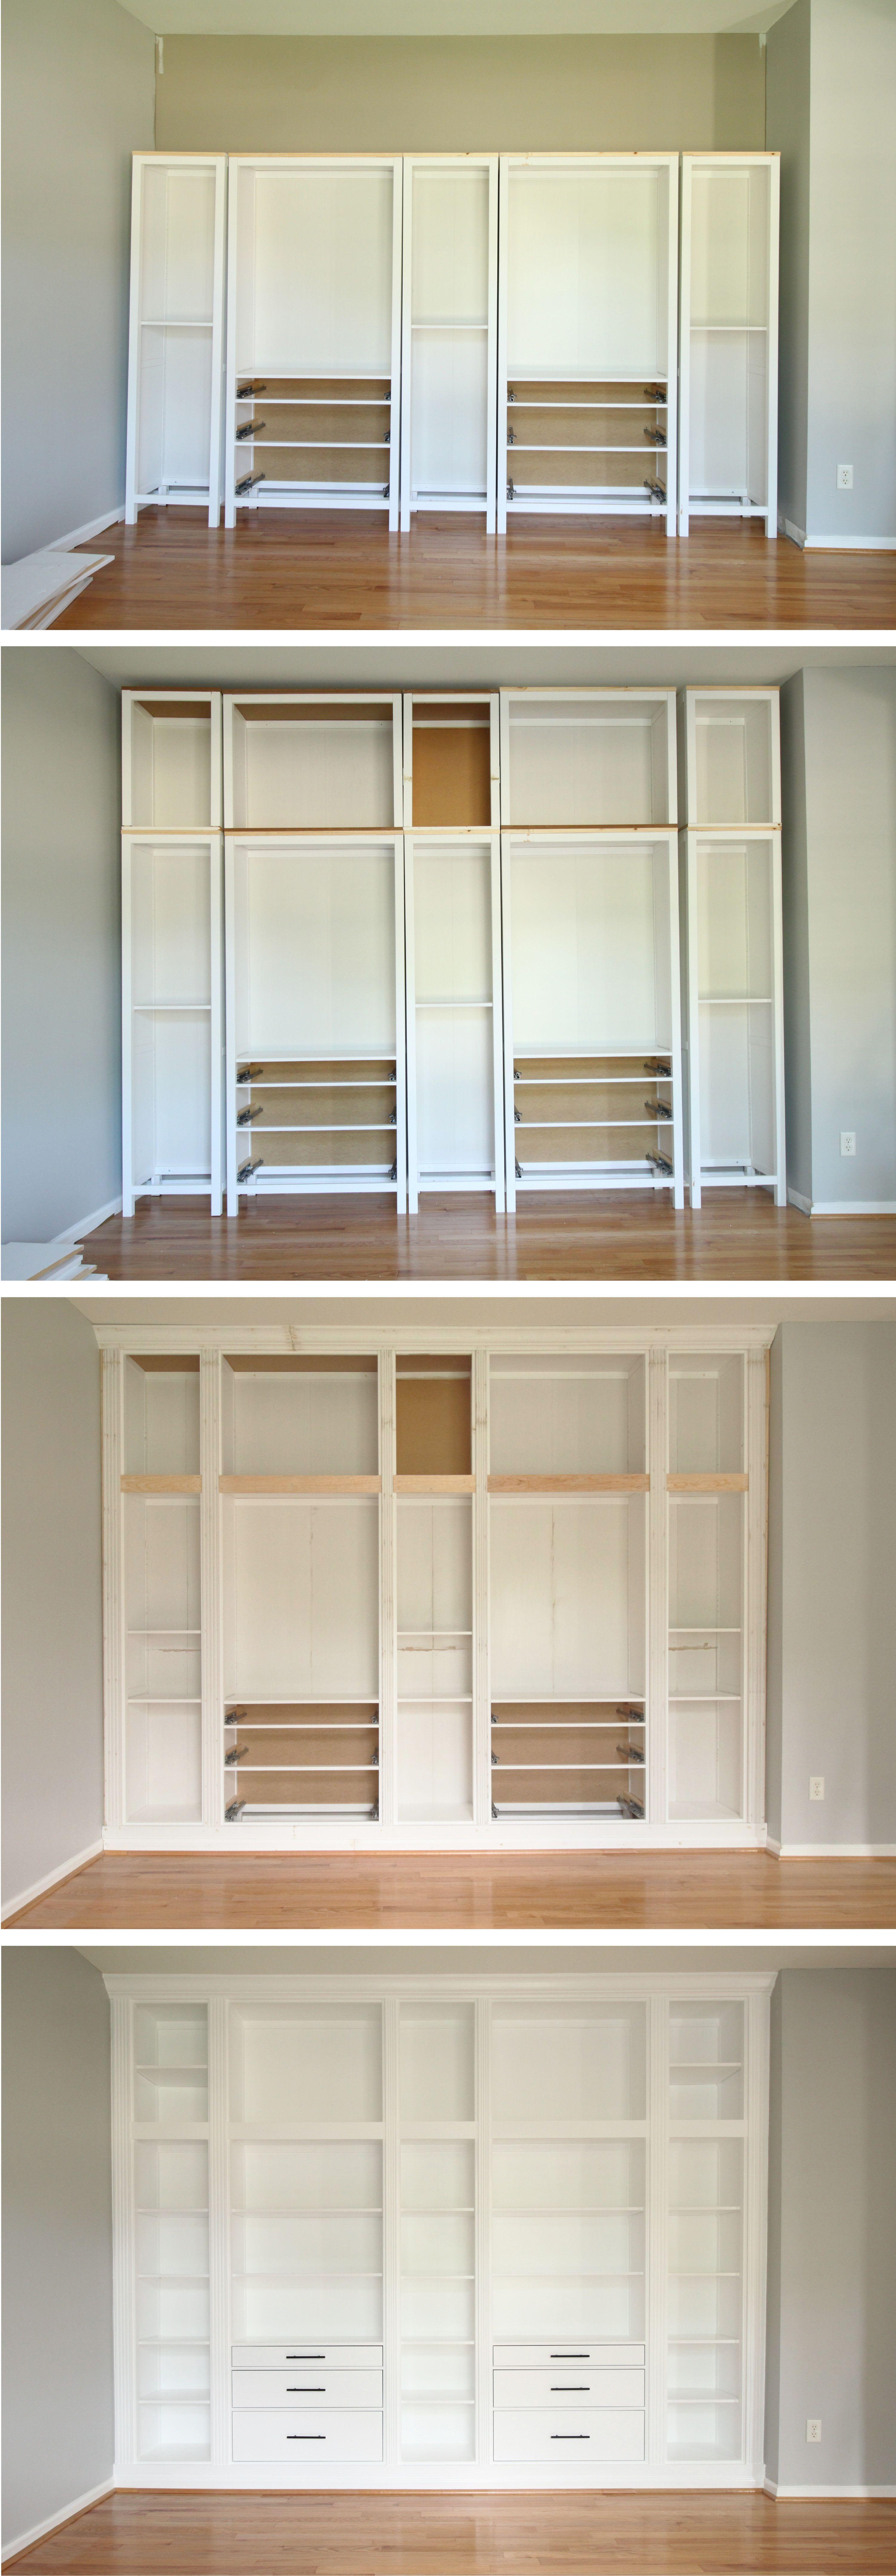 Ikea Hack Diy Built In Bookcase With Hemnes Furniture Studio  Interiors